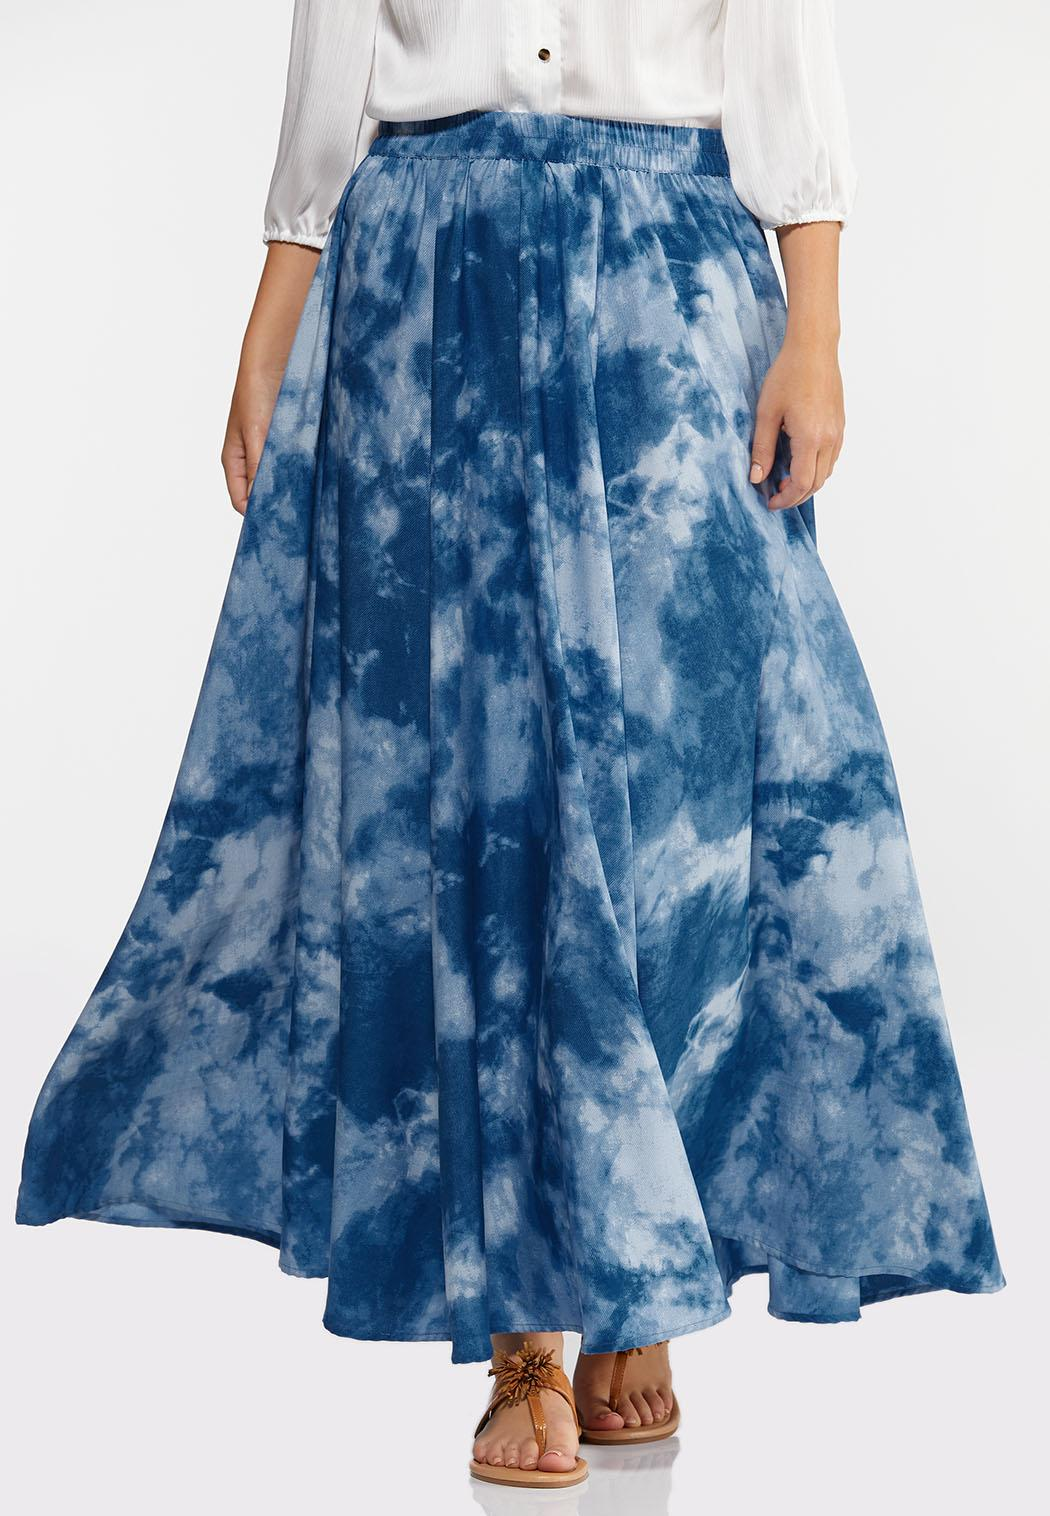 Sky Tie Dye Maxi Skirt